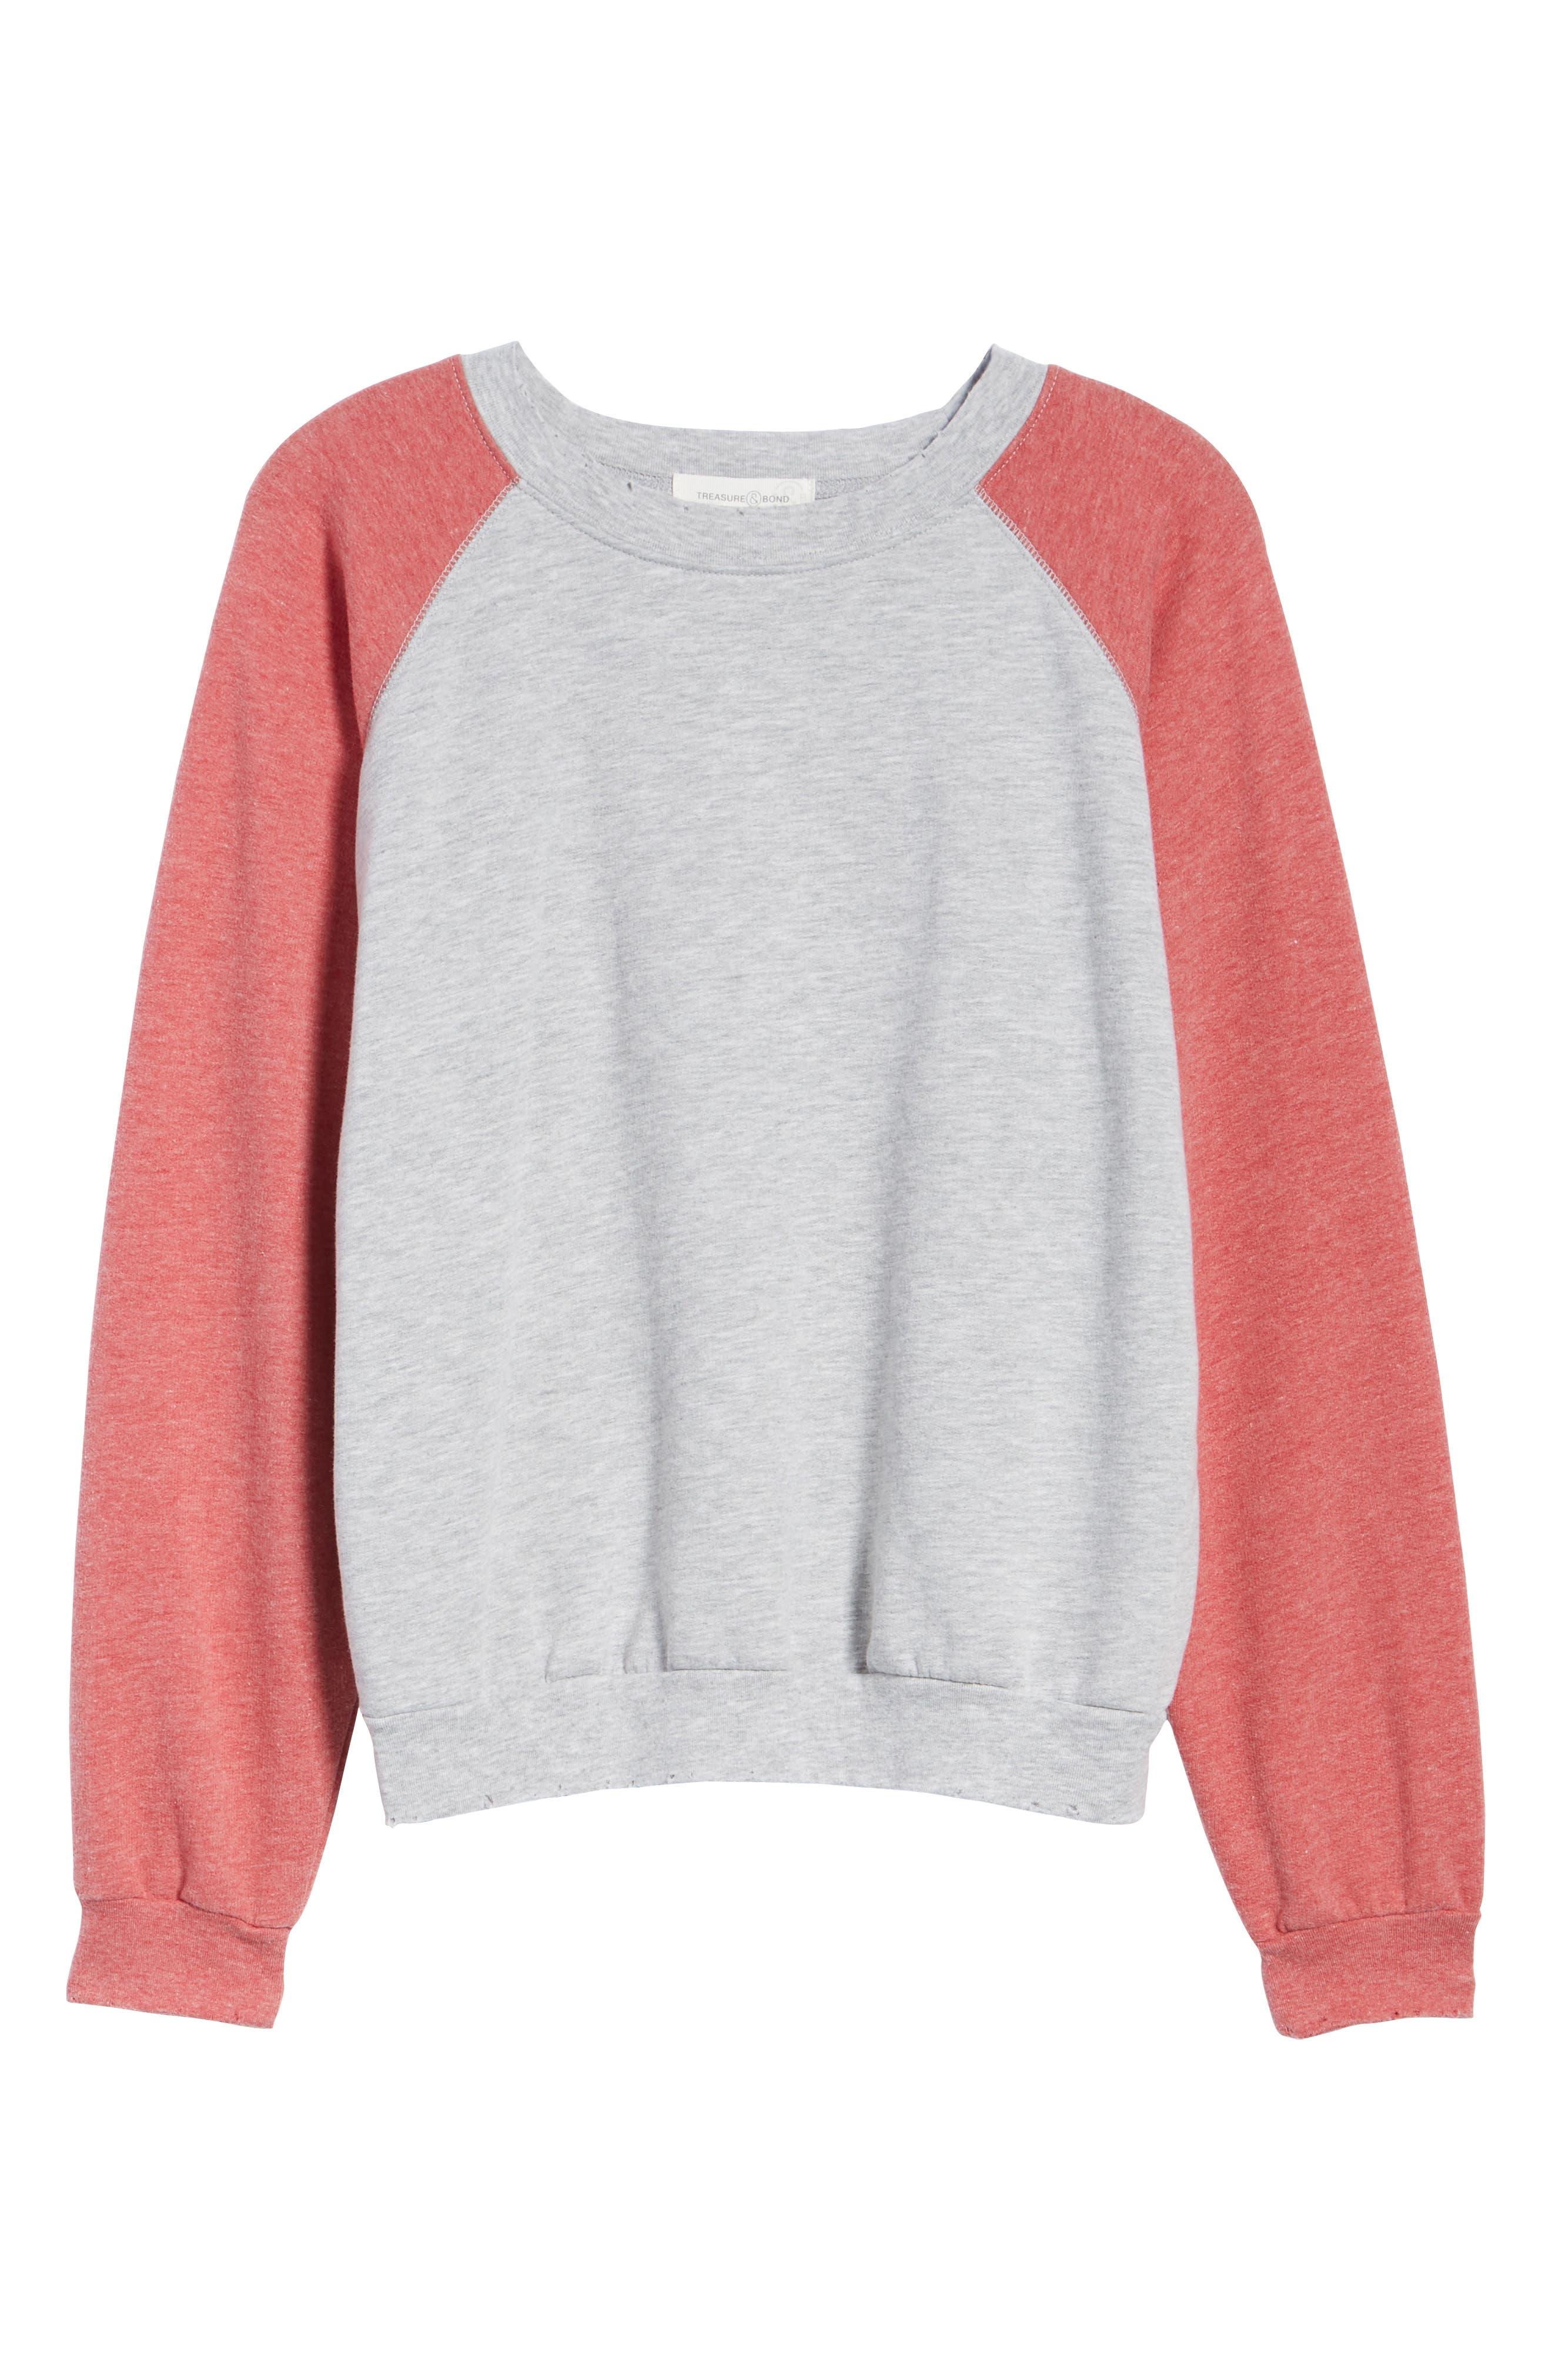 Raglan Sweatshirt,                             Alternate thumbnail 6, color,                             050